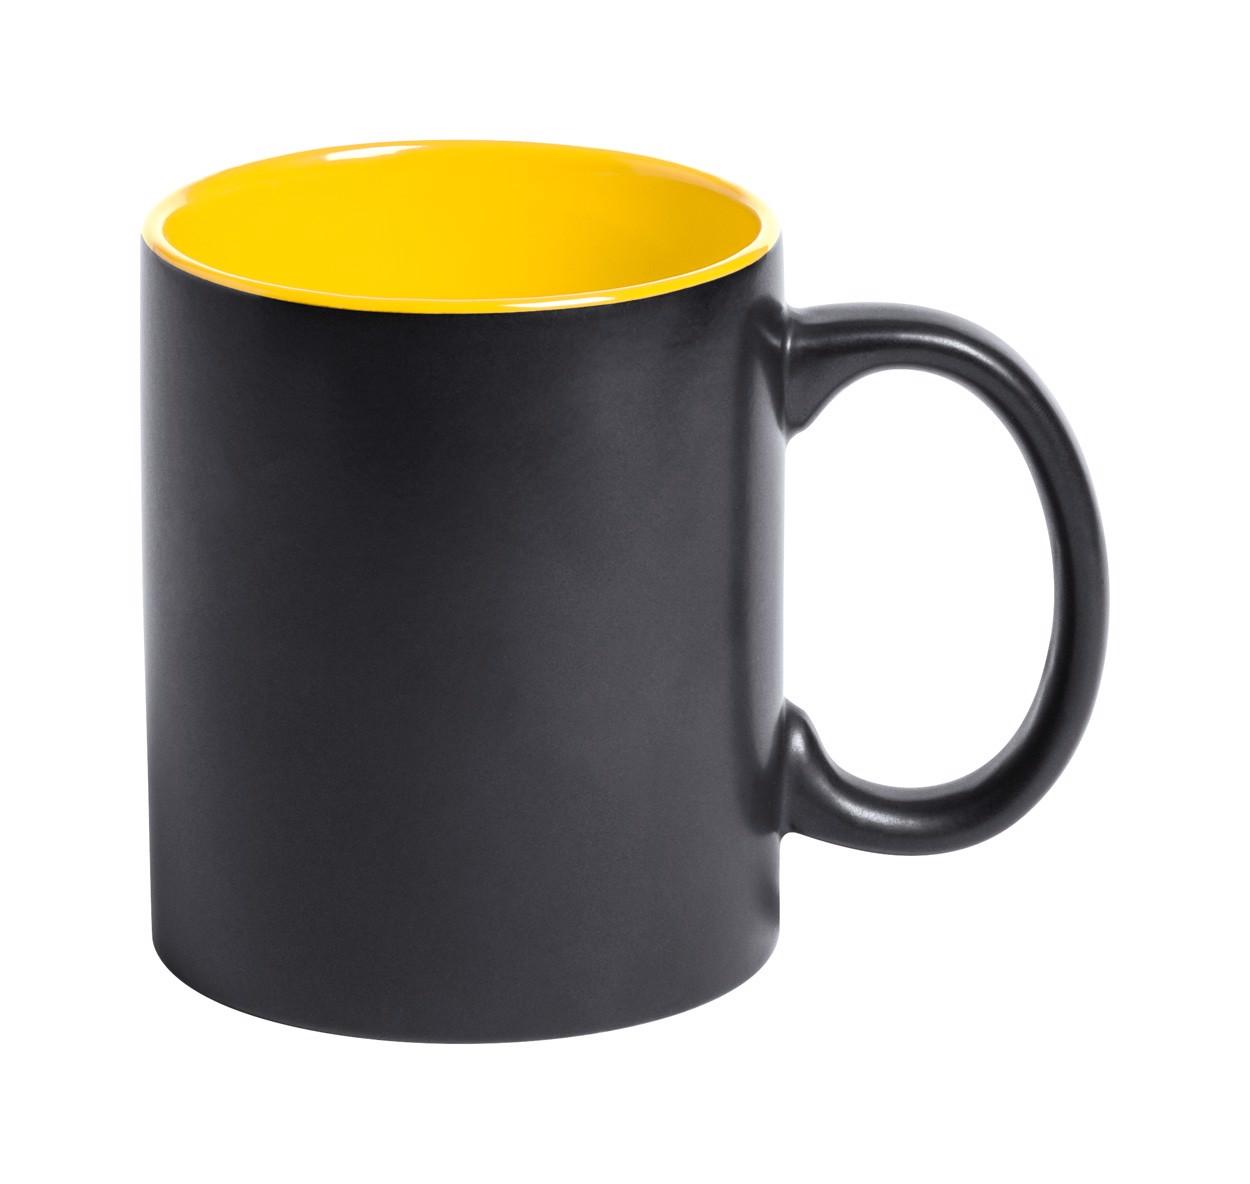 Hrnek Bafy - Černá / Žlutá